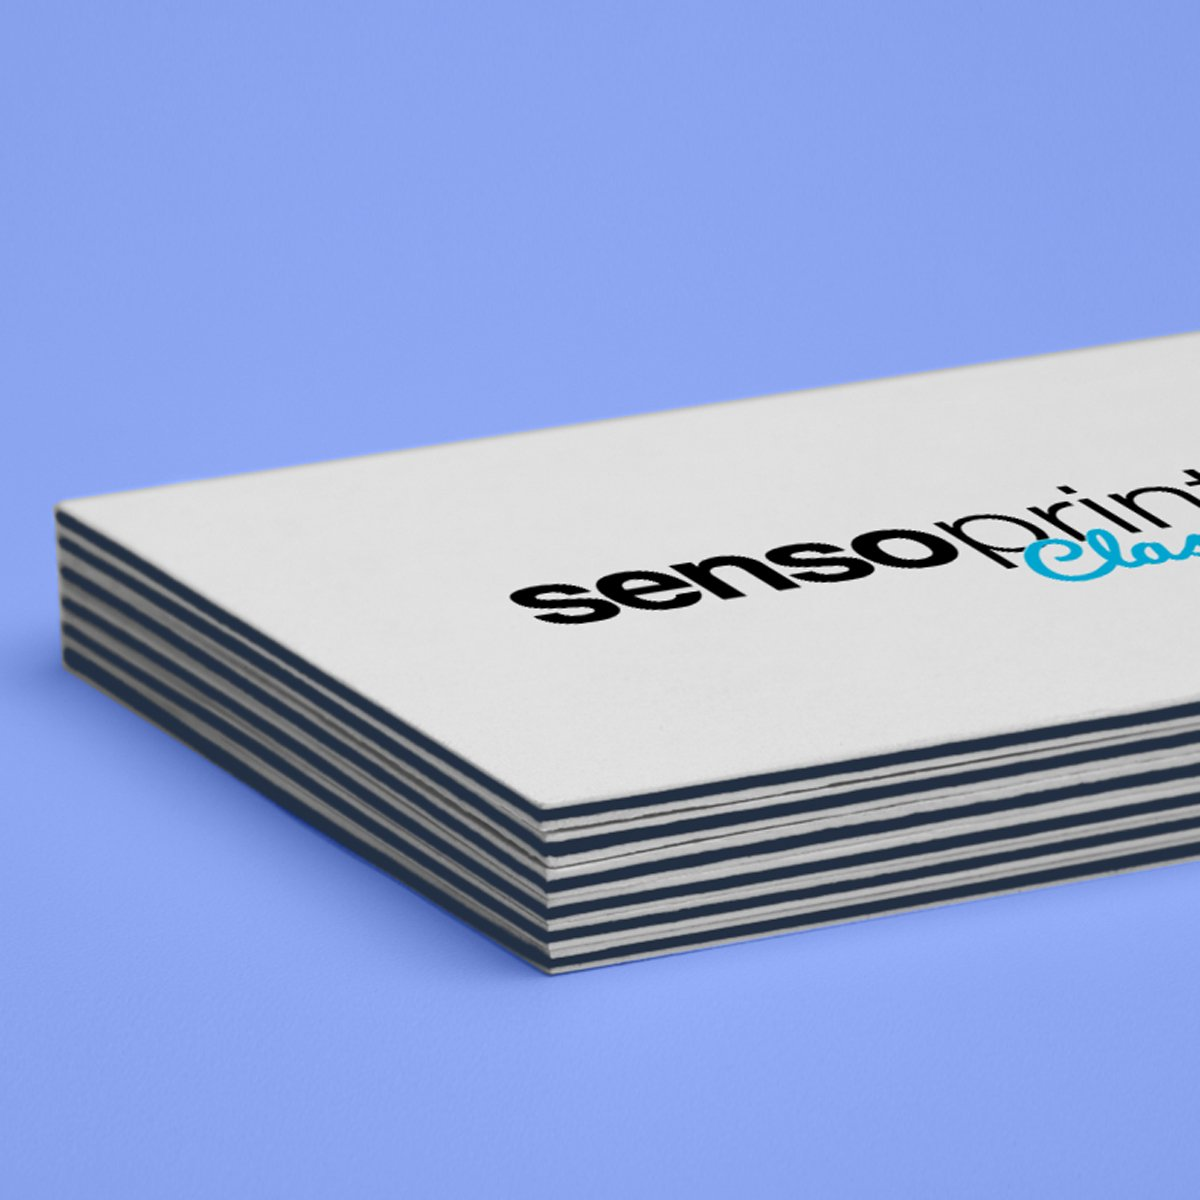 https://www.sensoprint.frcarte de visite epaisse